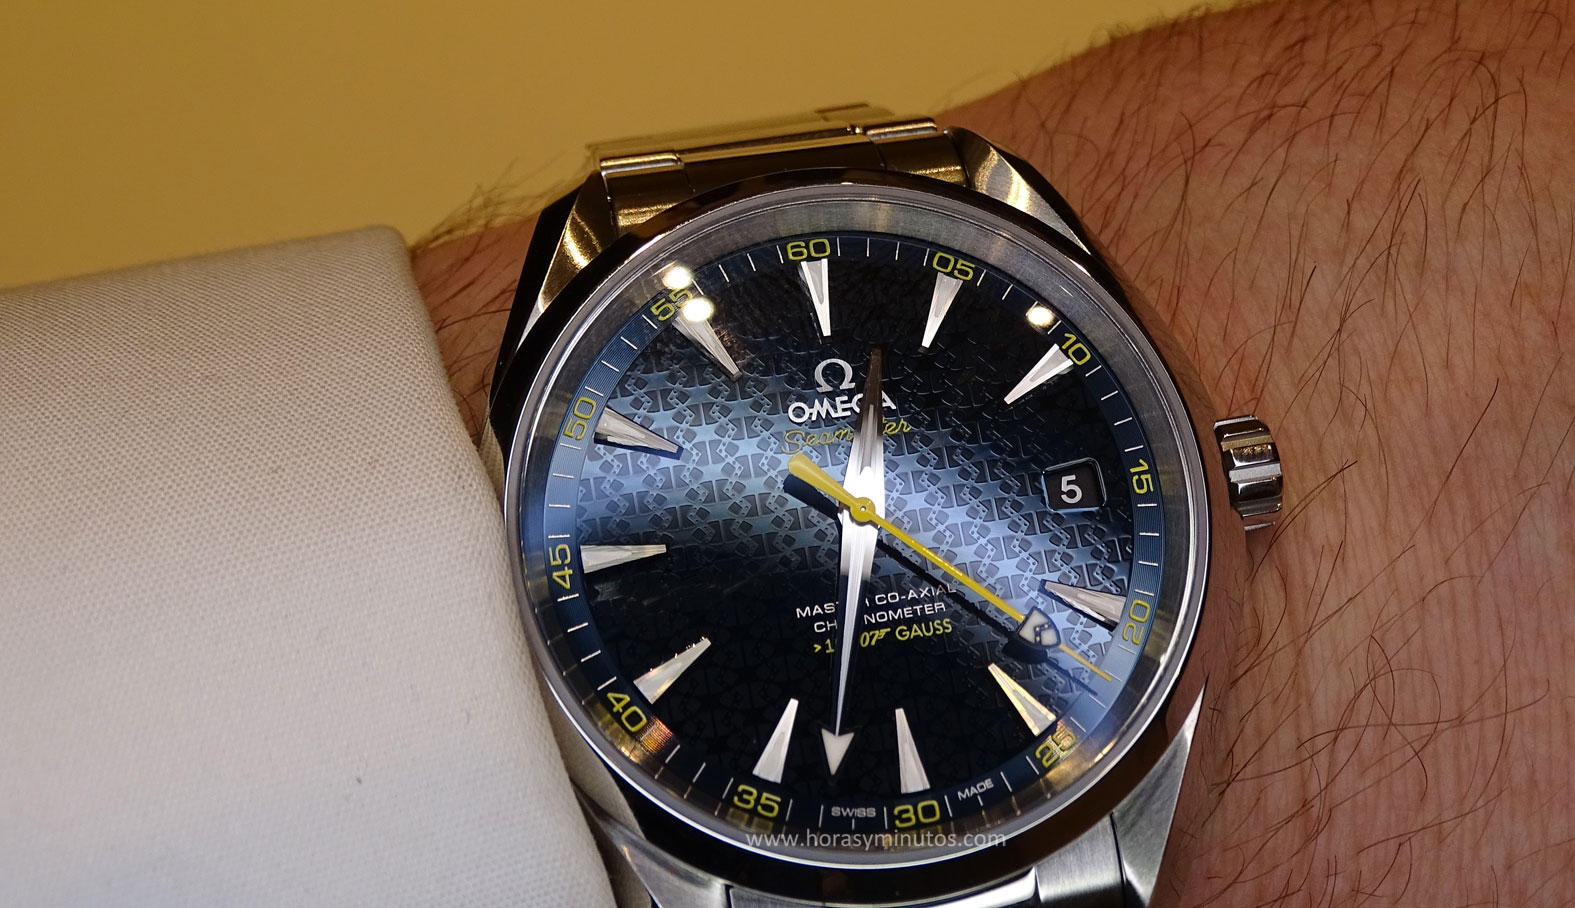 OMEGA Seamaster James Bond Spectre - textura